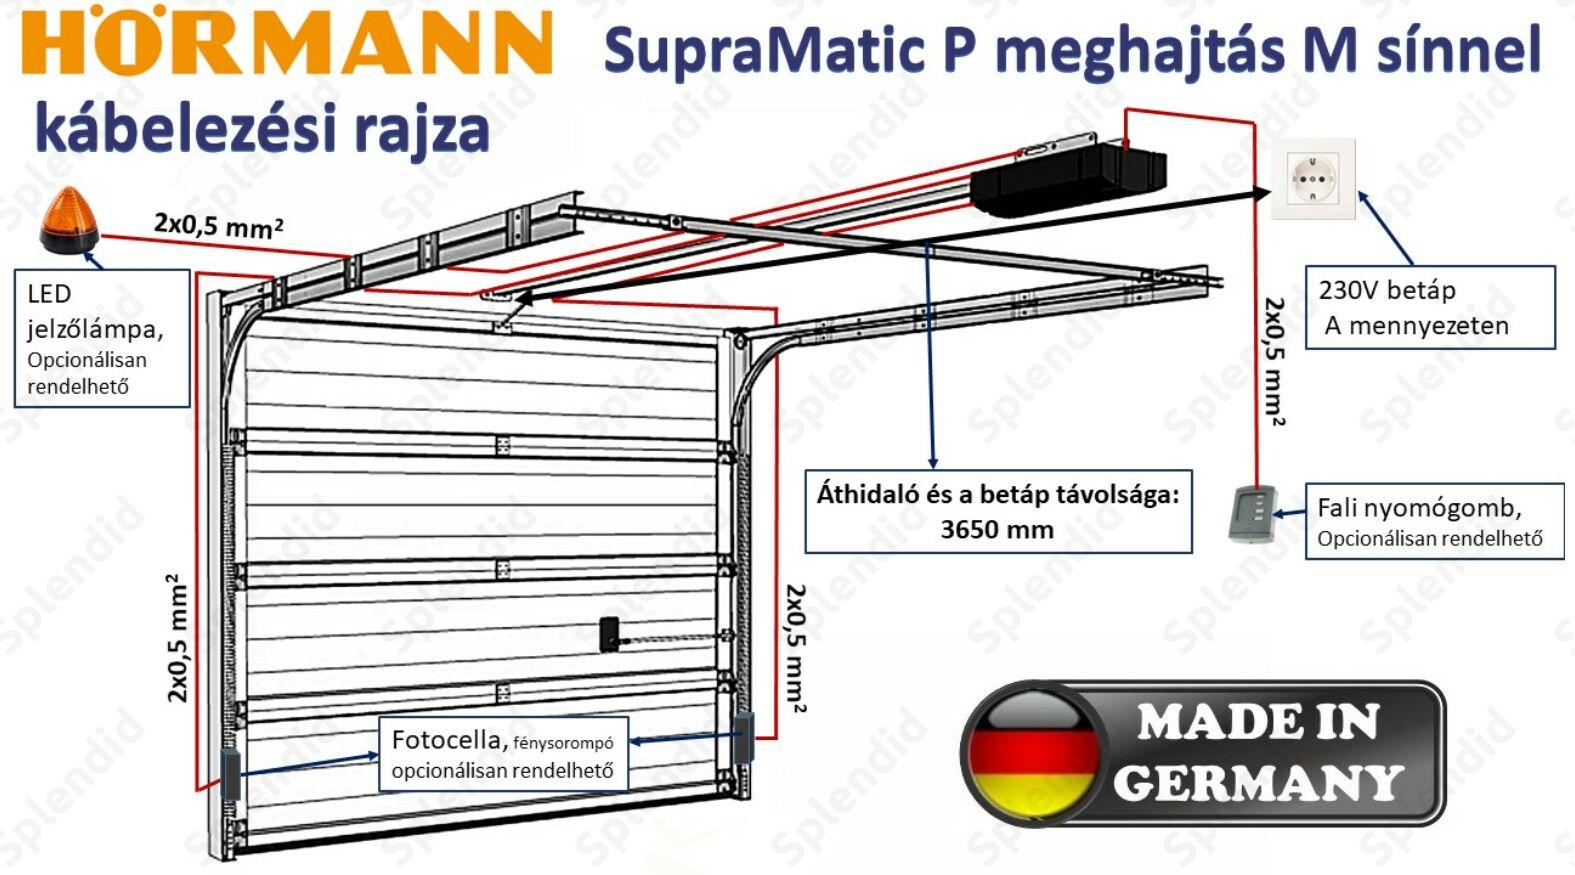 h rmann supramatic p 3 gar zskapu meghajt s k s nnel gar zsnyit szettek. Black Bedroom Furniture Sets. Home Design Ideas